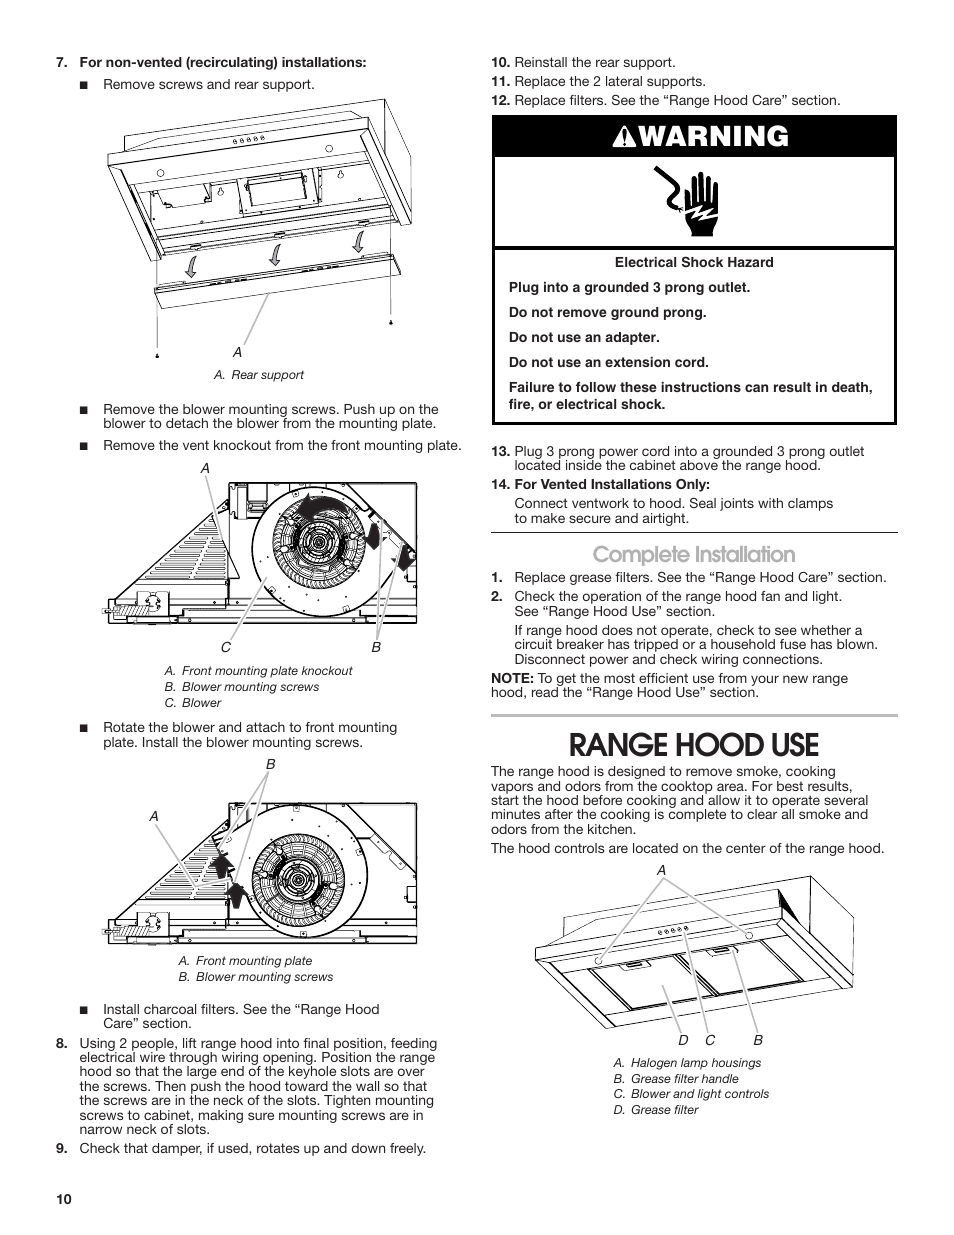 hight resolution of range hood use warning complete installation maytag uxt5536aas manuel d utilisation page 10 28